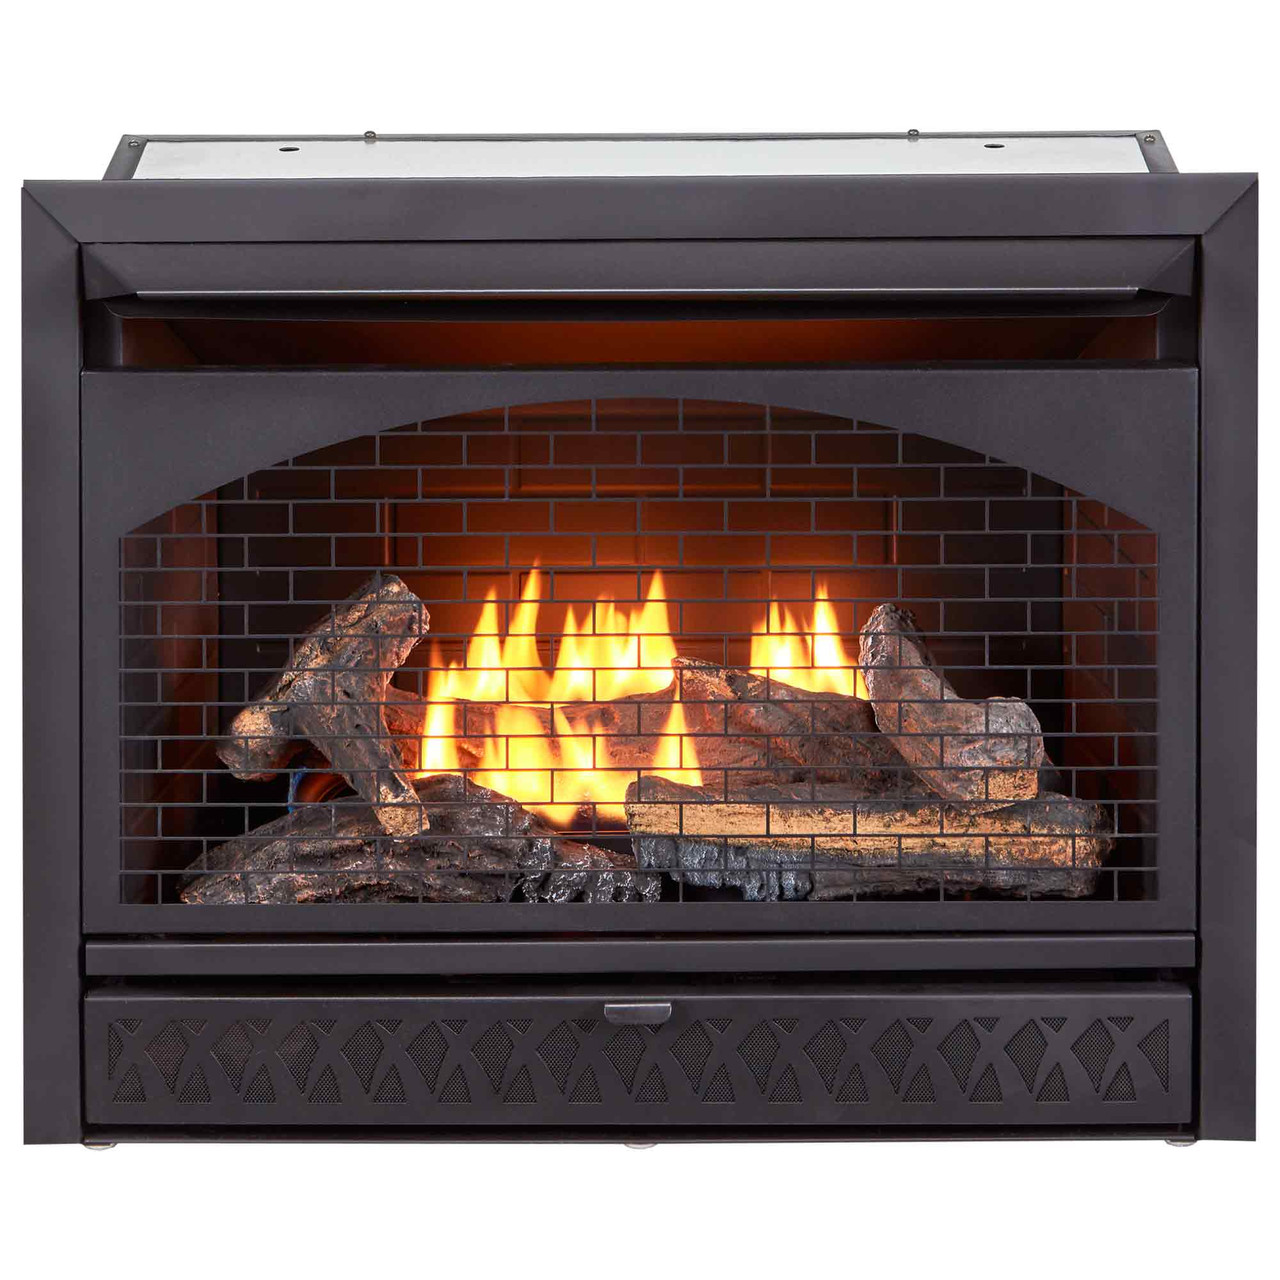 Amazing Procom Fireplaces 29 In Ventless Dual Fuel Firebox Insert Fbnsd28T Interior Design Ideas Grebswwsoteloinfo